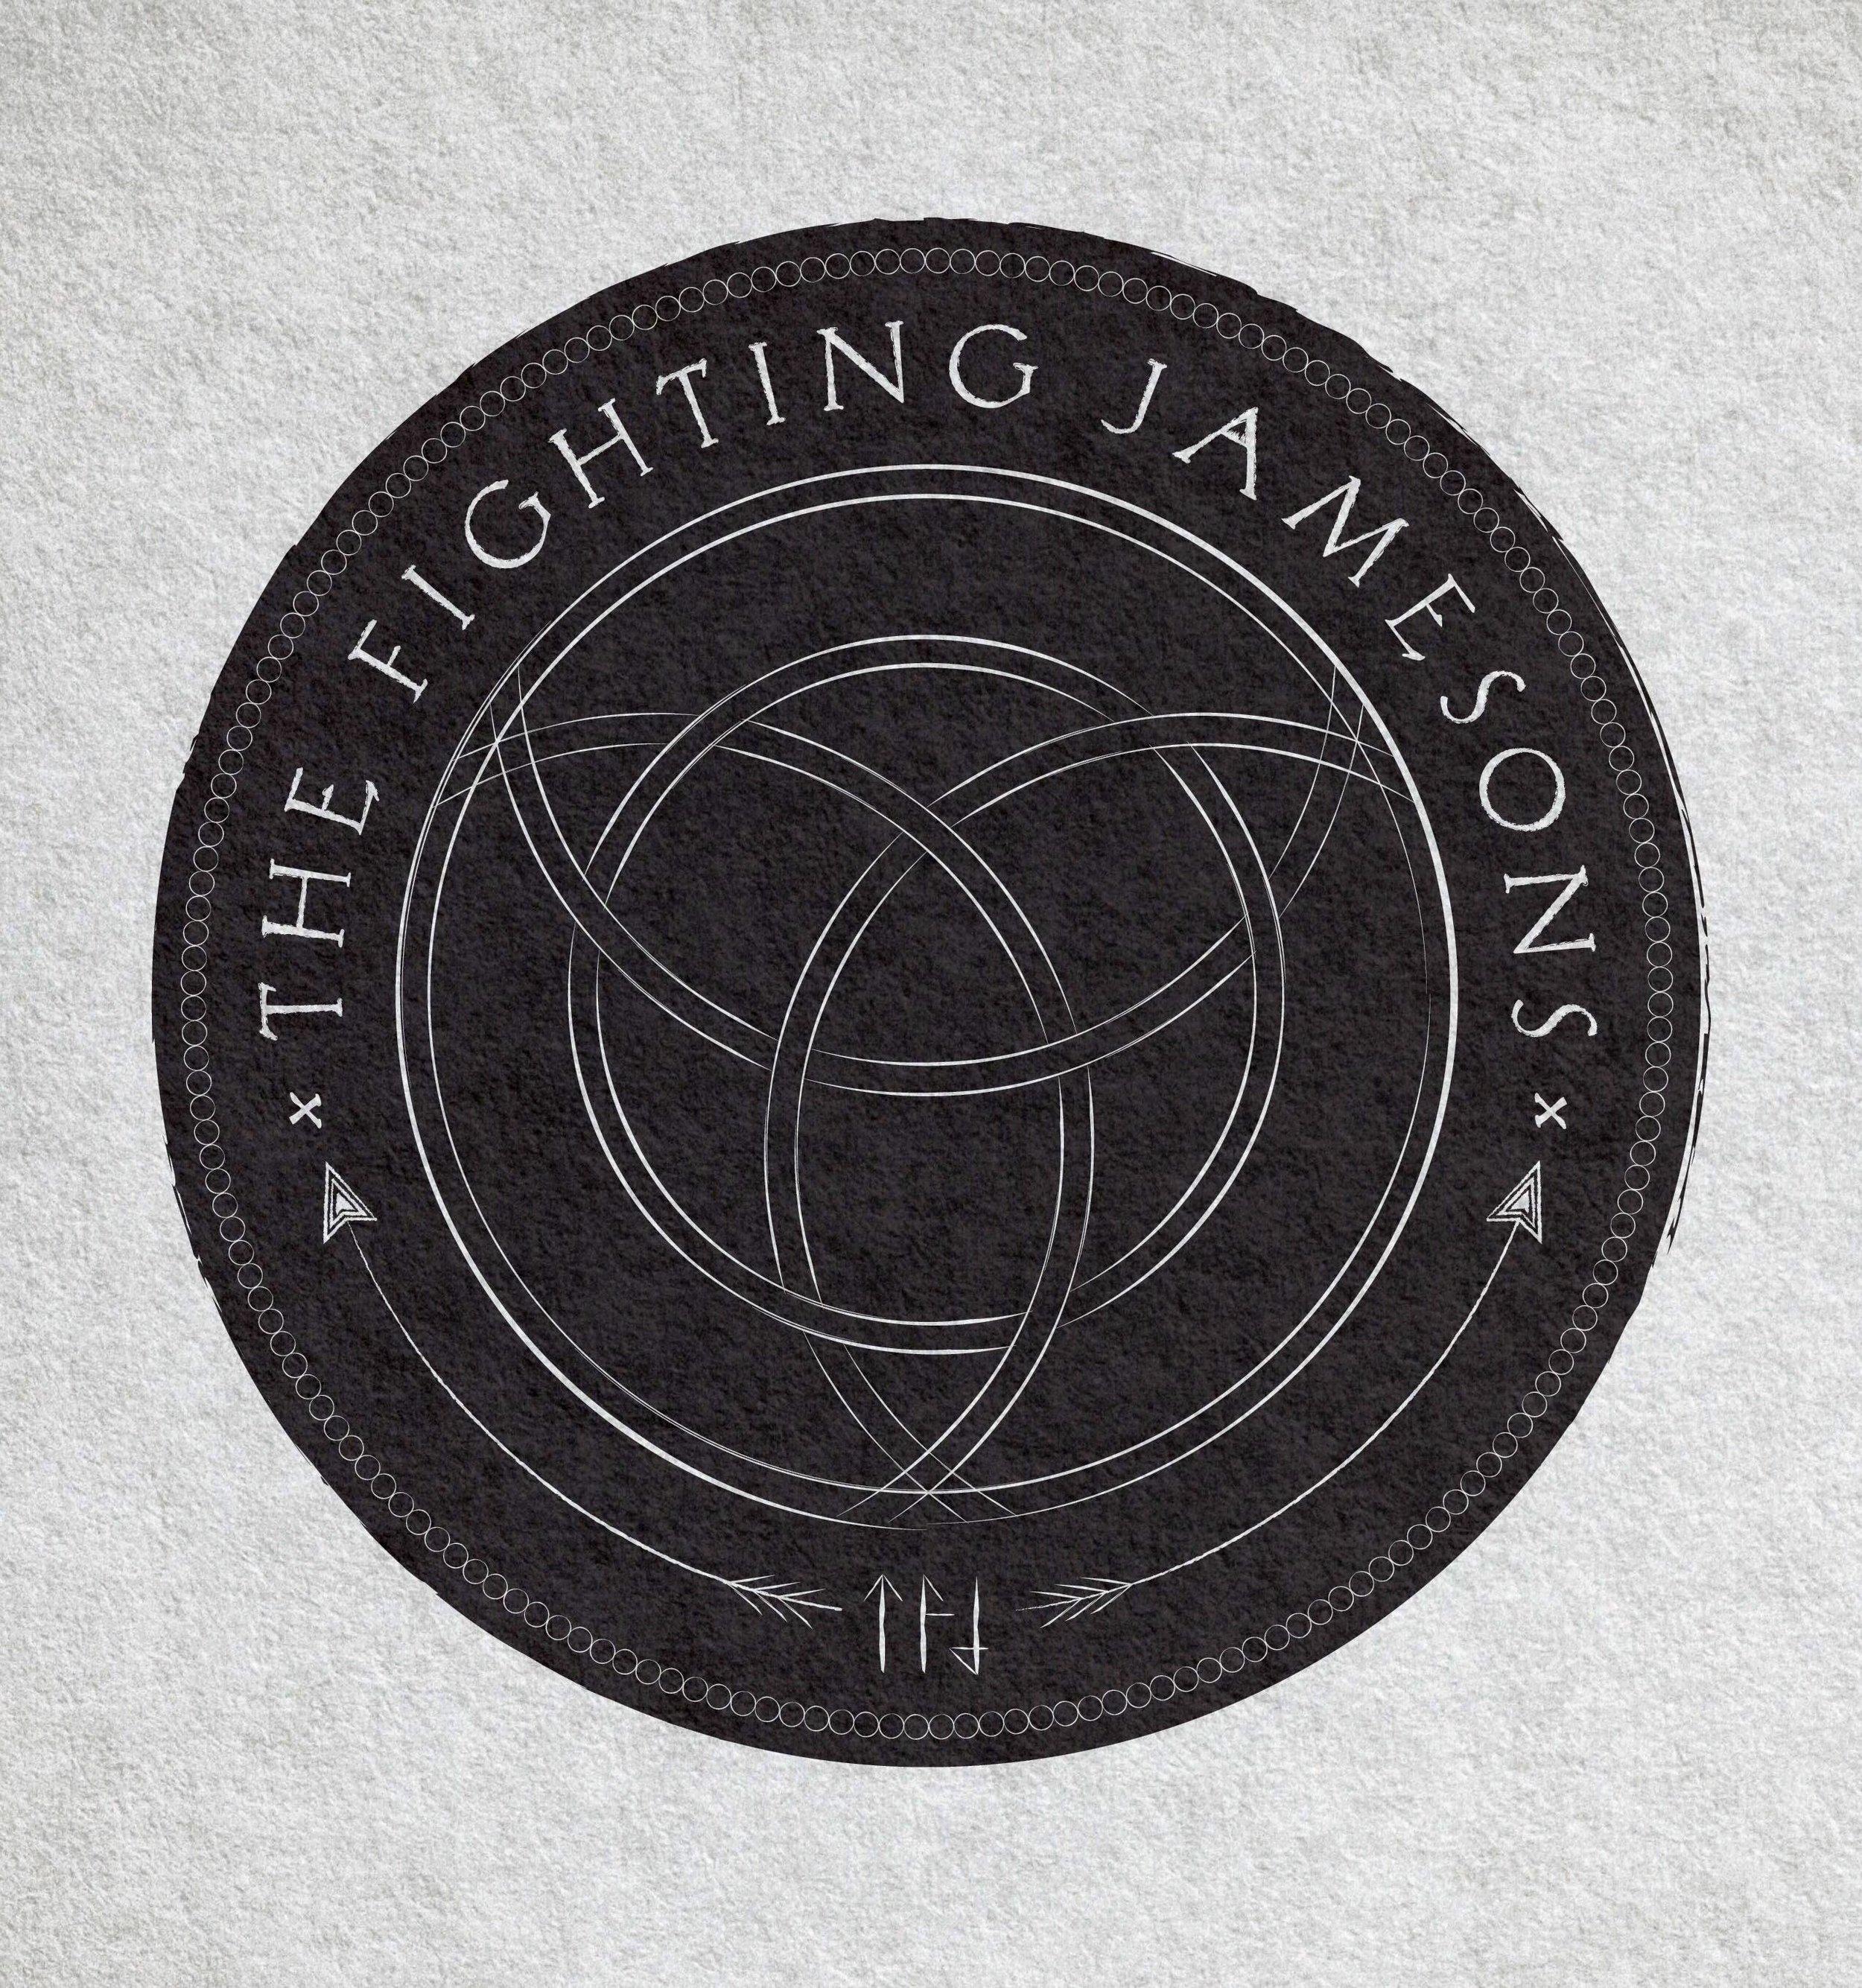 The Fighting Jamesons!